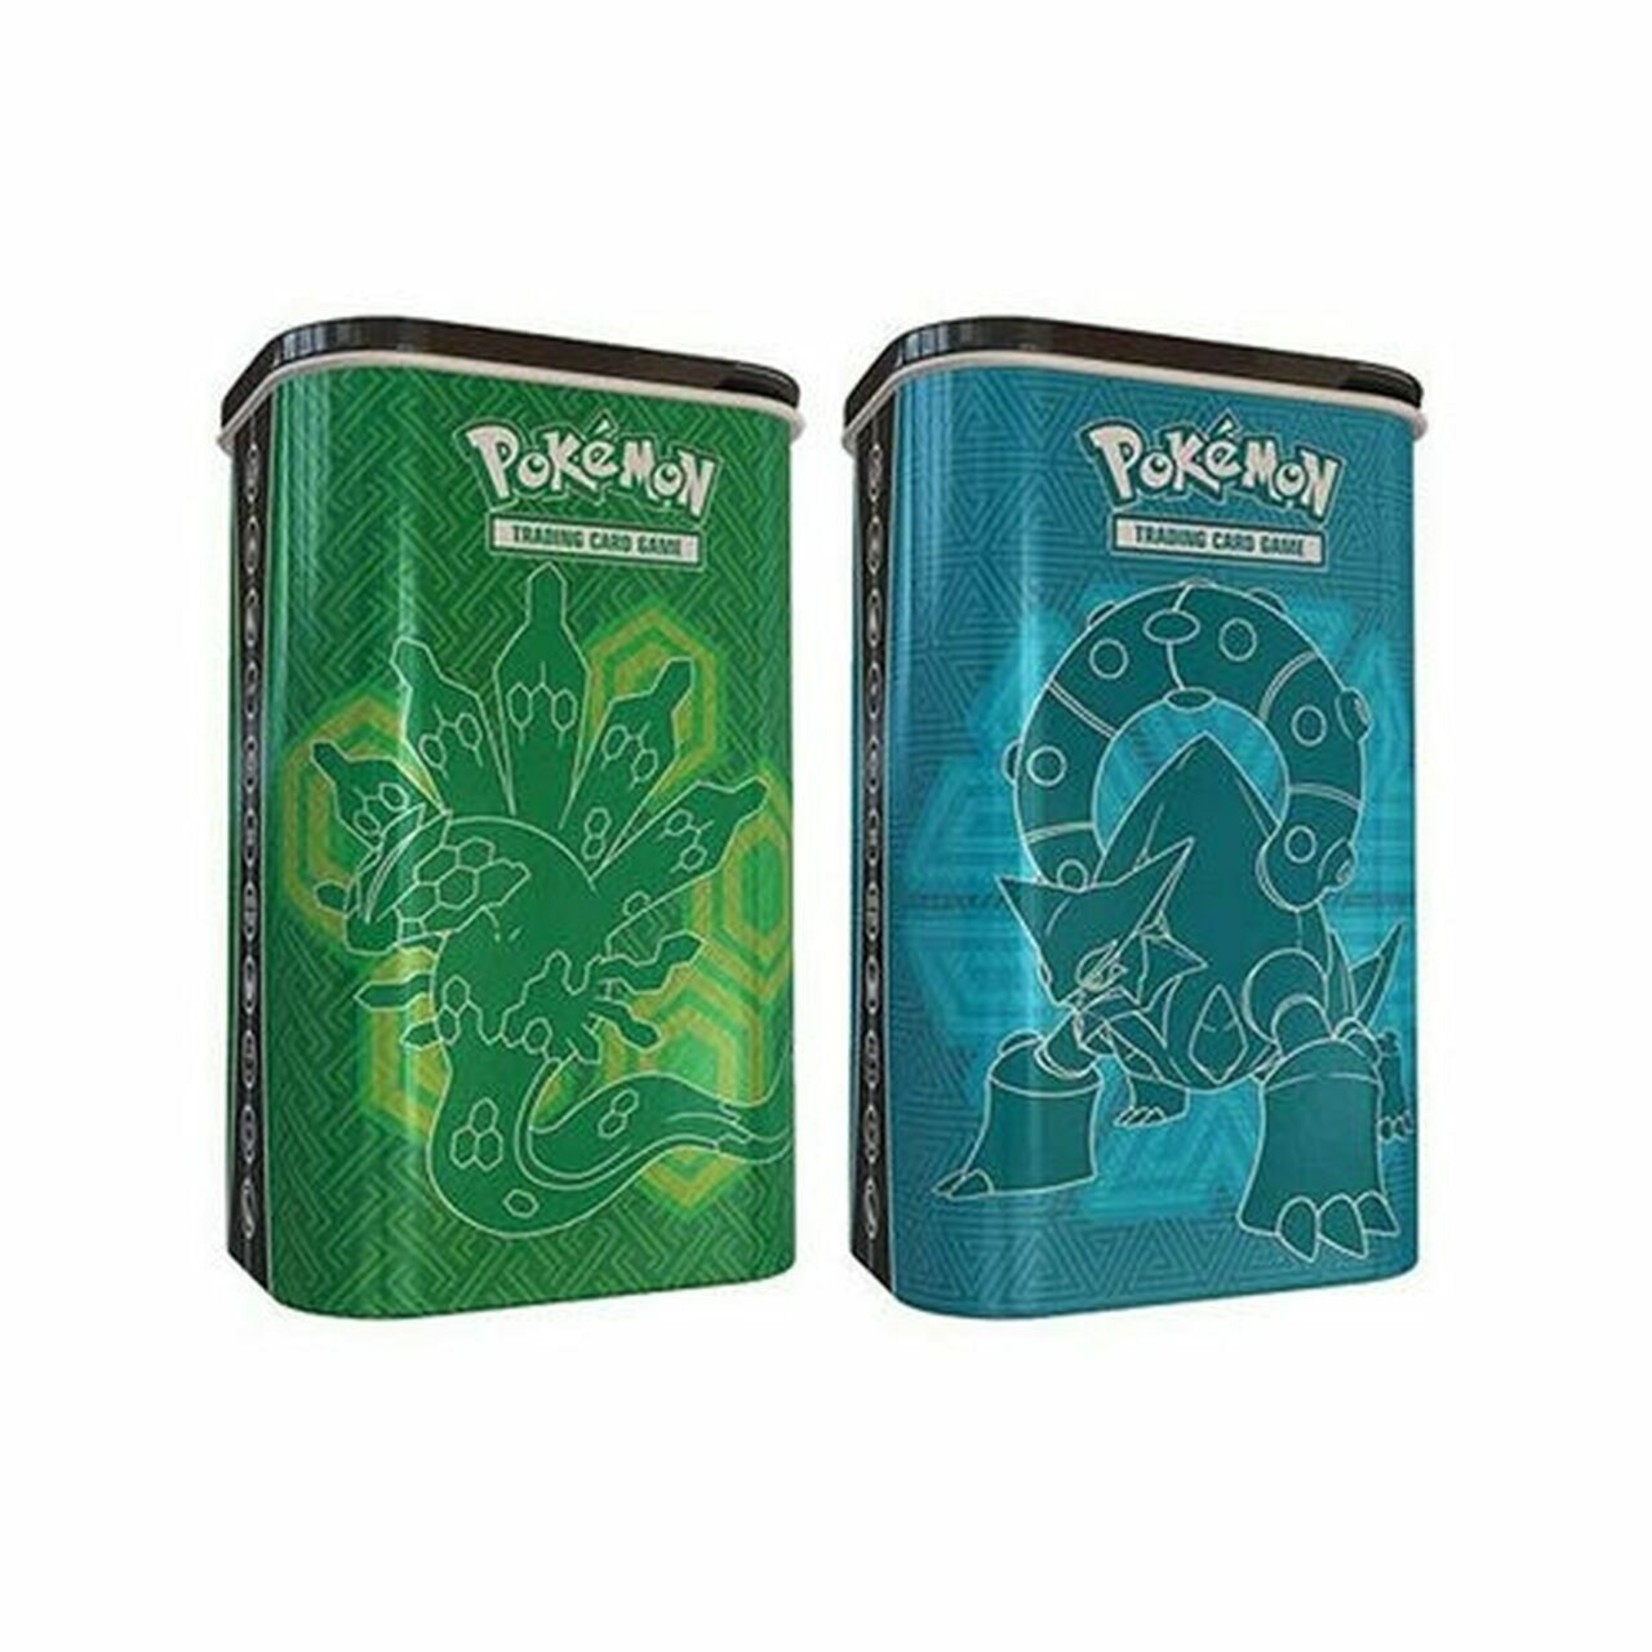 The Pokemon Company POKEMON ELITE TRAINER DECK SHIELD Volcanion/Zygarde